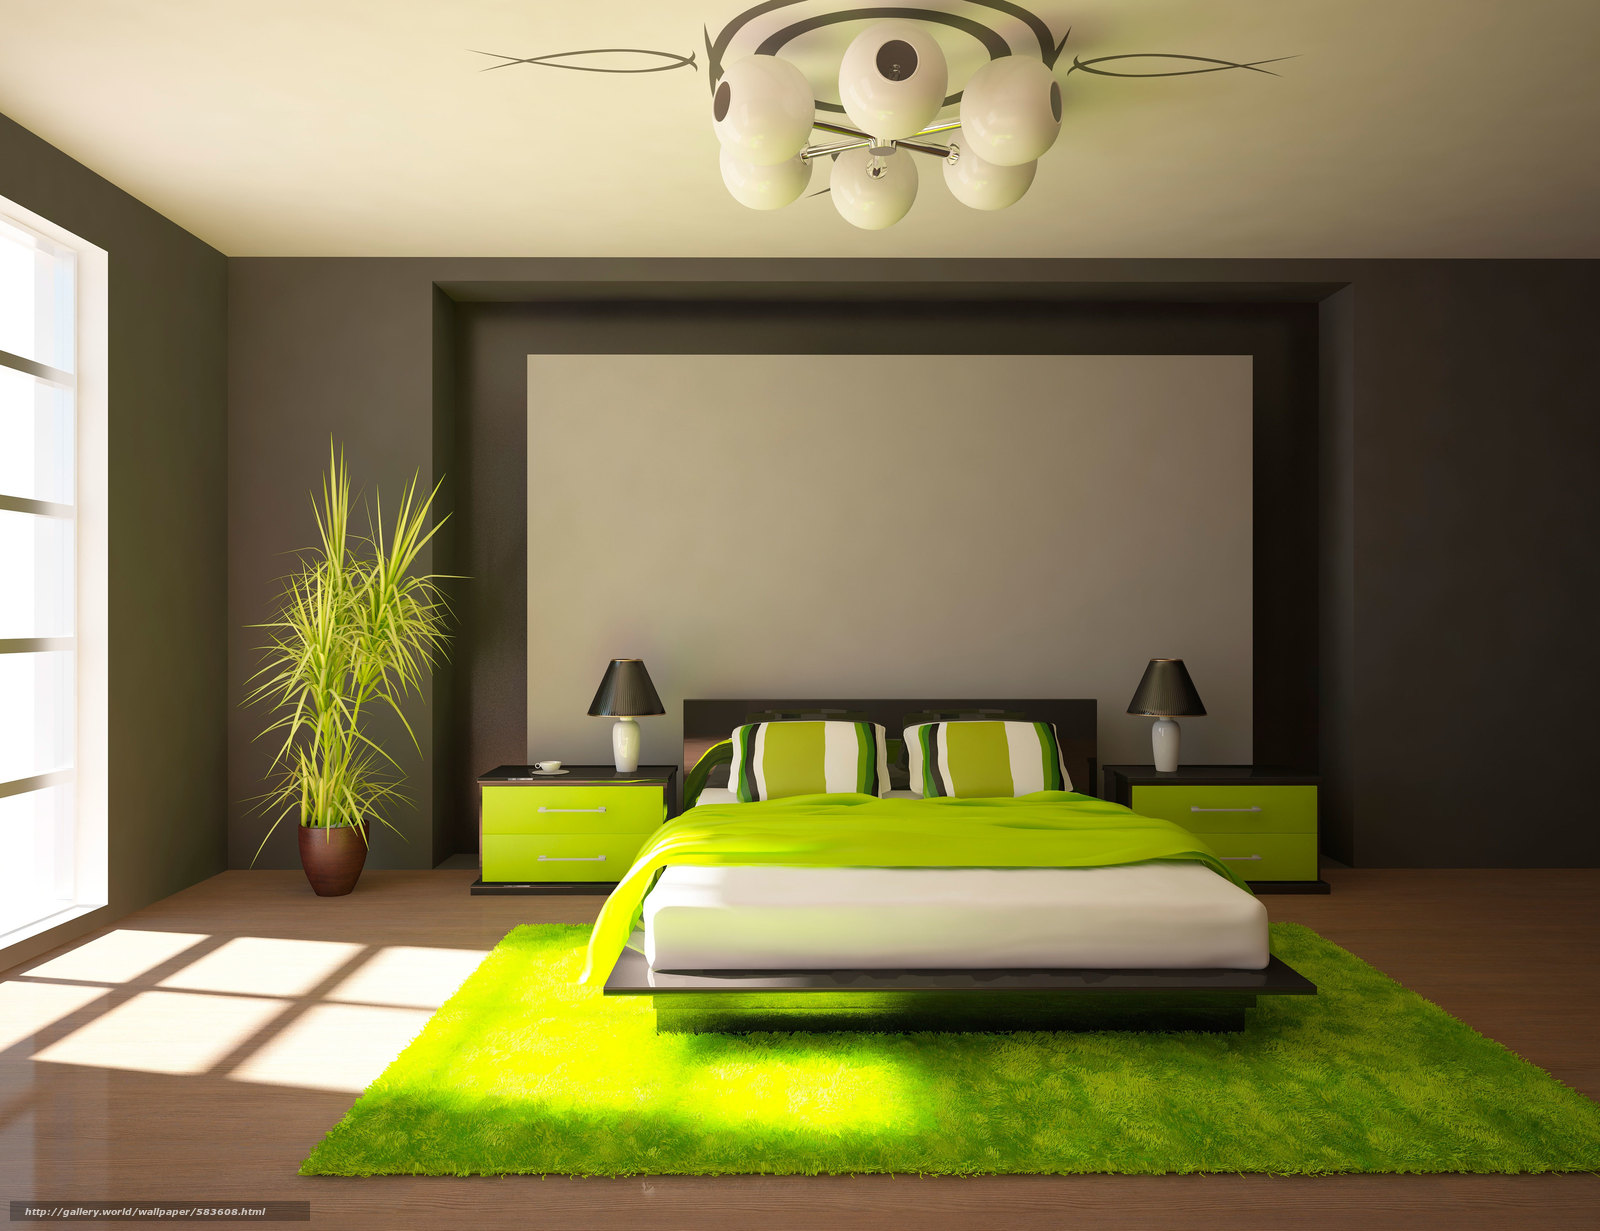 Download wallpaper BEDROOM,  room,  style,  interior free desktop wallpaper in the resolution 4500x3462 — picture №583608